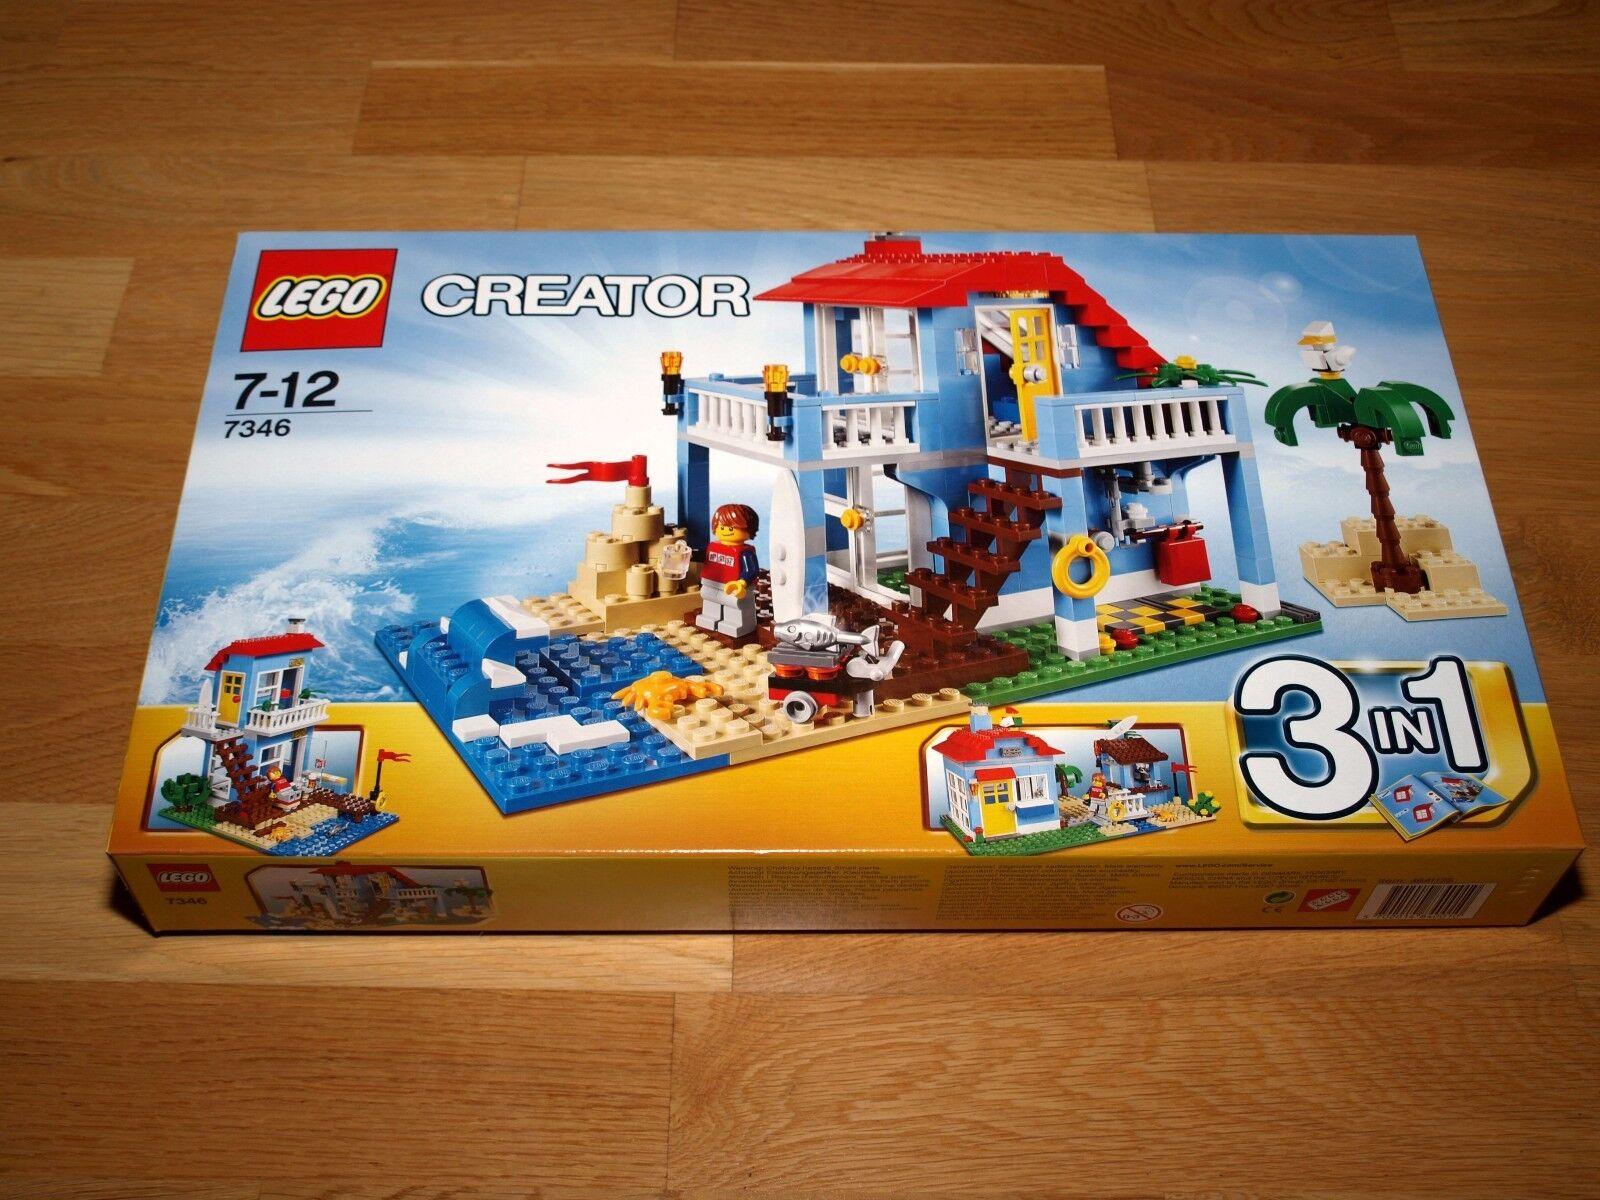 Lego Creator – Seaside House Set 7346 - Retired BNISB